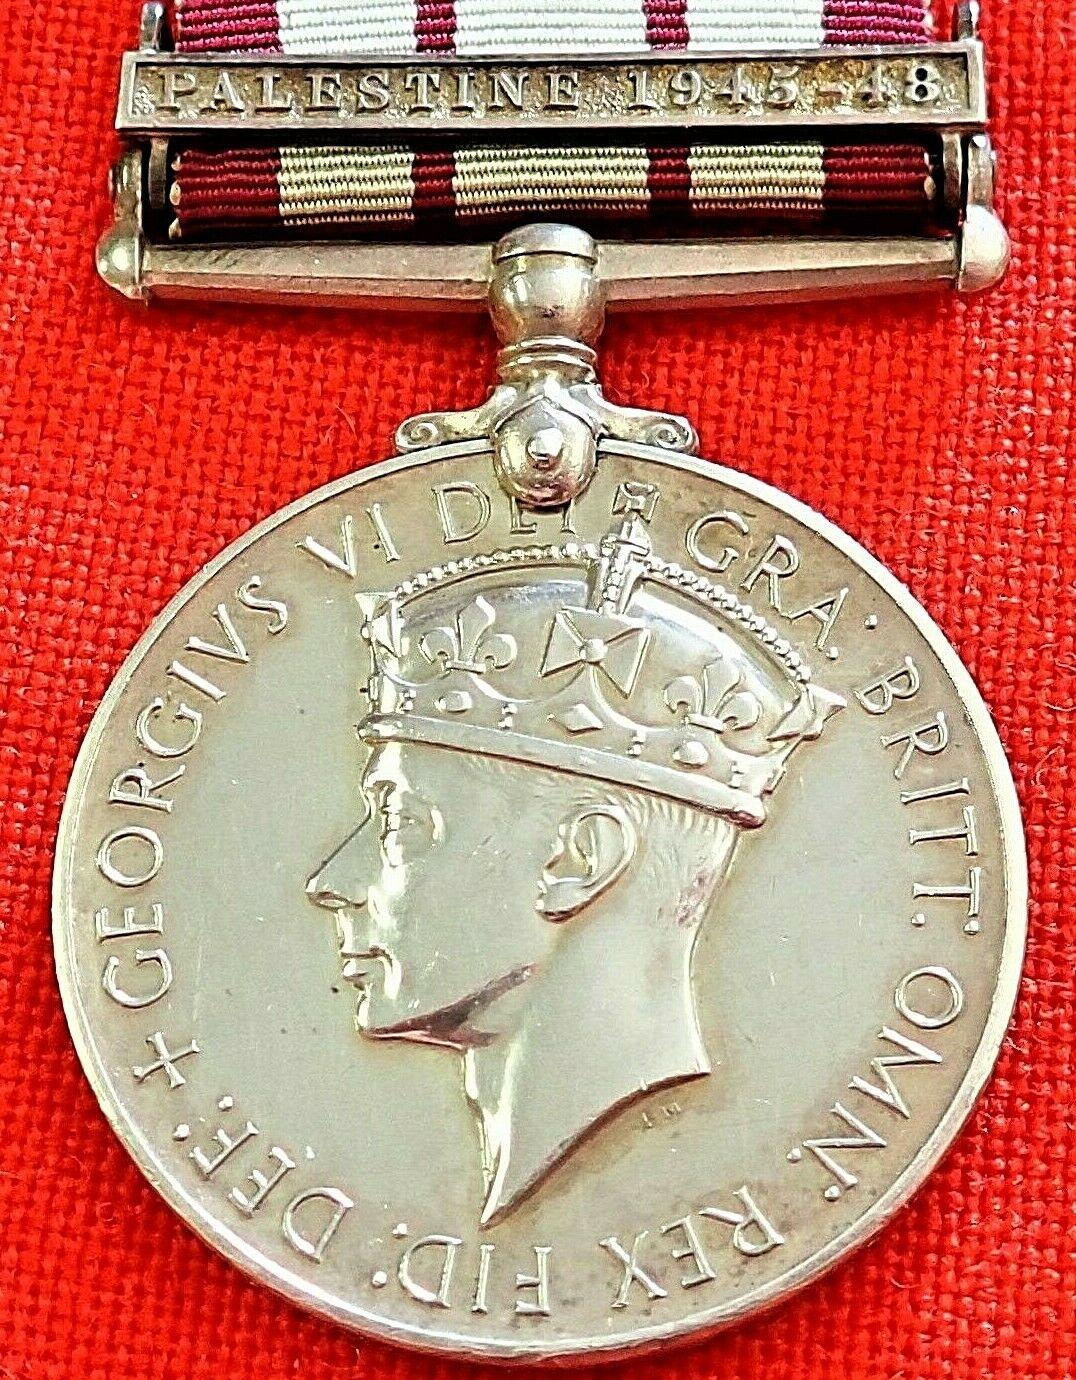 NAVAL GENERAL SERVICE MEDAL (1915) CLASP PALESTINE 1945-48. R.H.HUMPHREYS. R.N